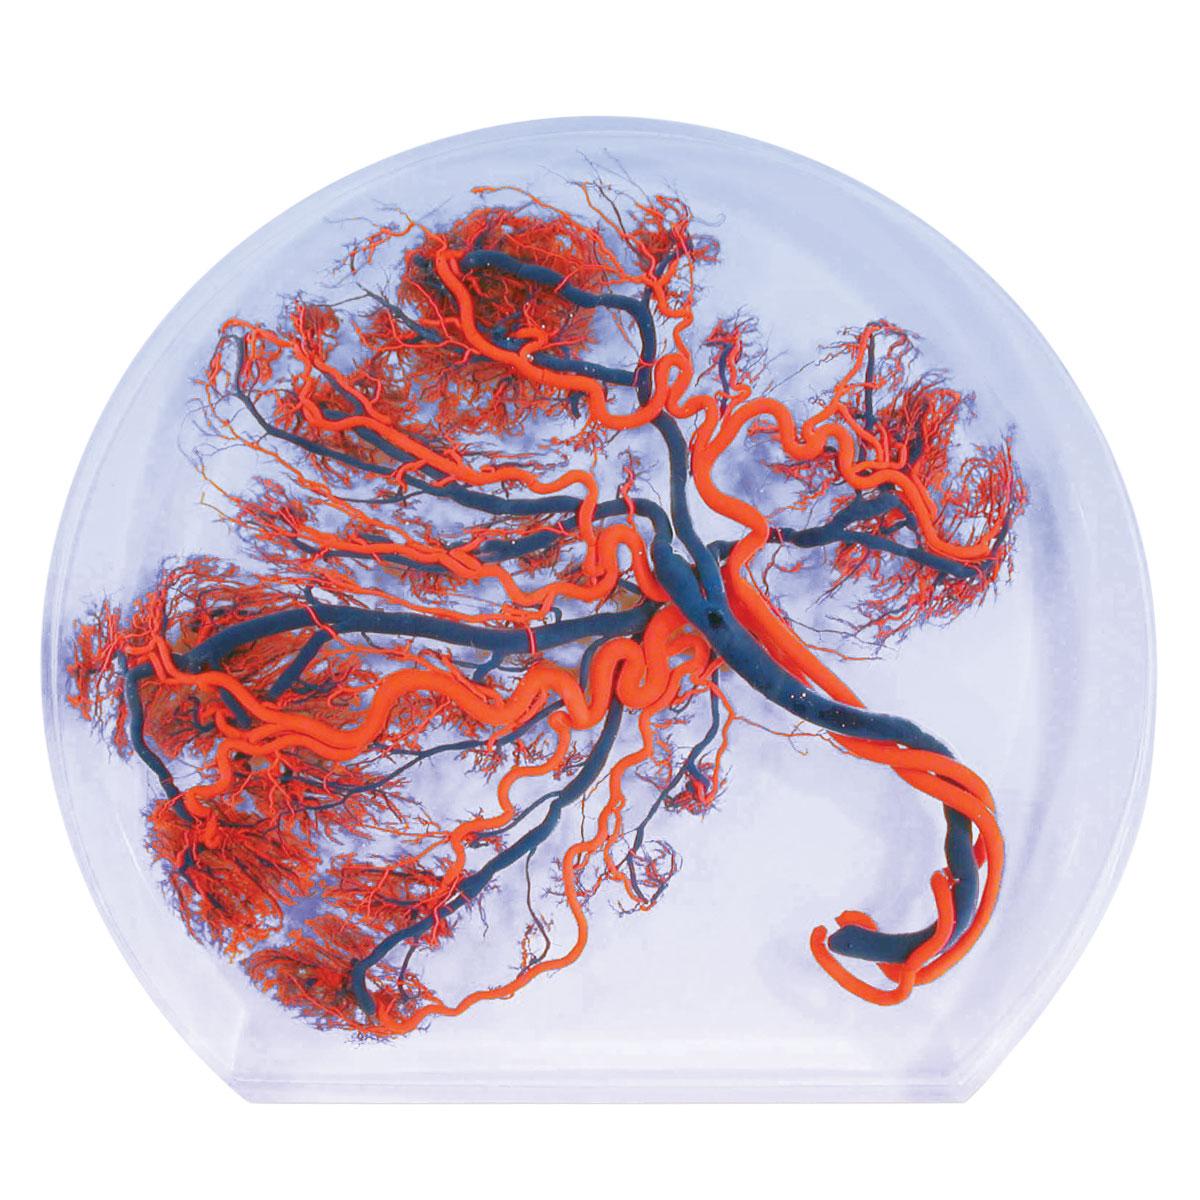 Placenta - 1003645 - W10604 - MENSCHL. PLAZENTA - Anatomical Models ...